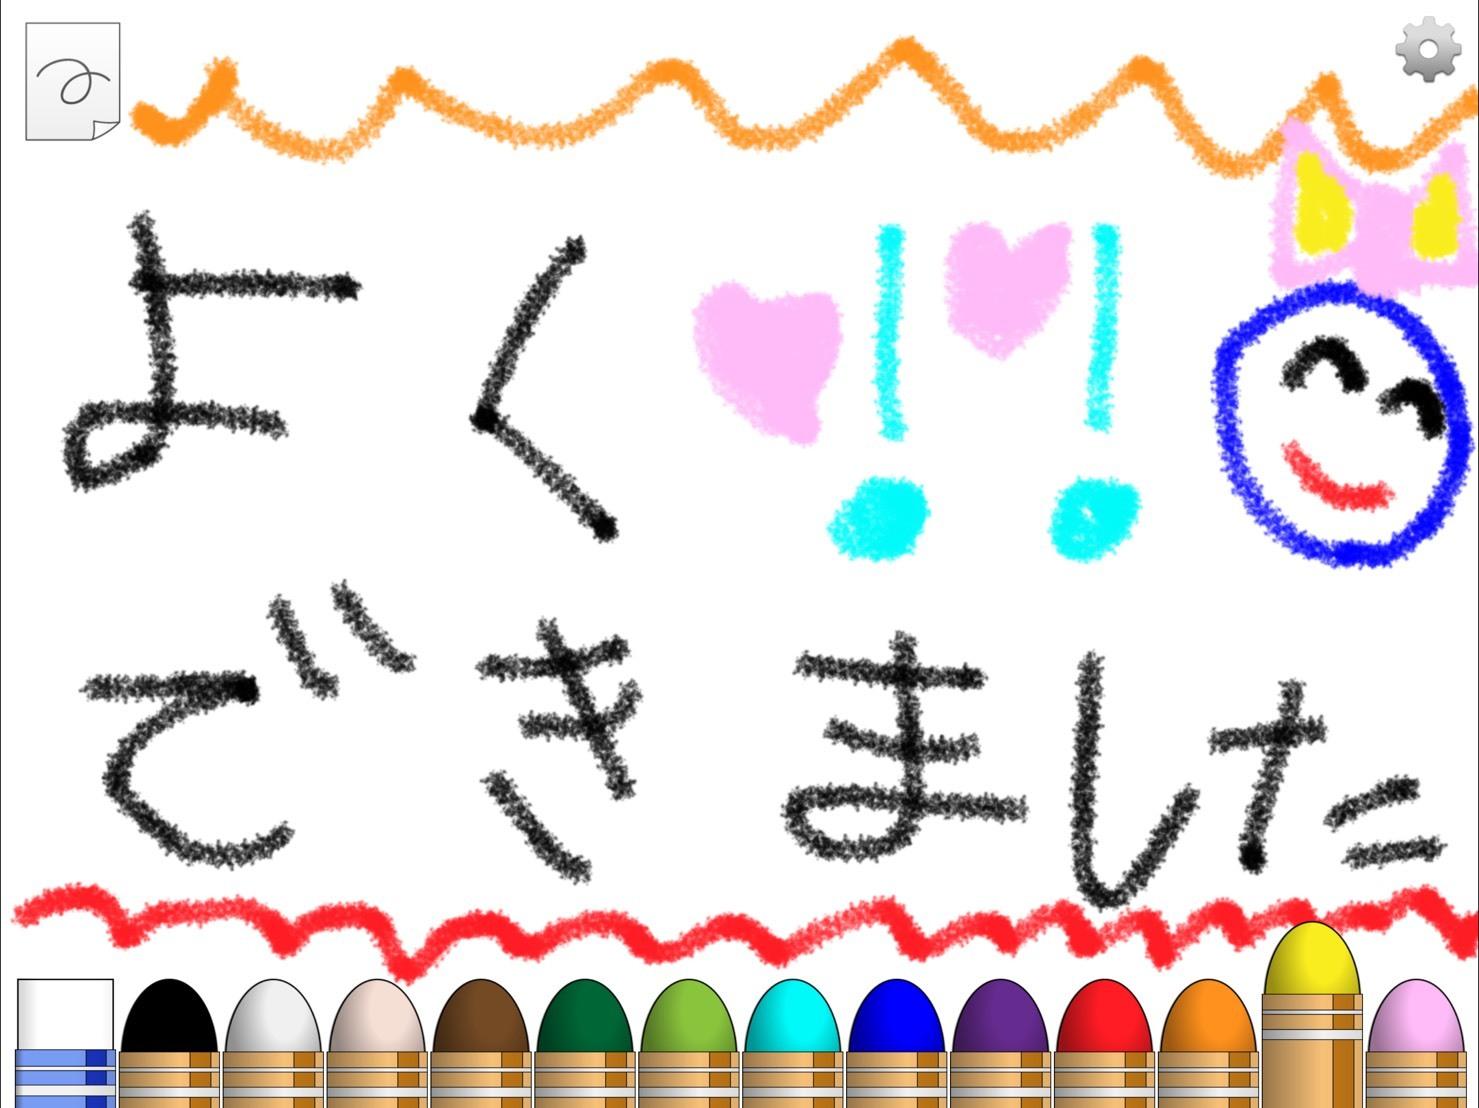 IMG_1847.jpg